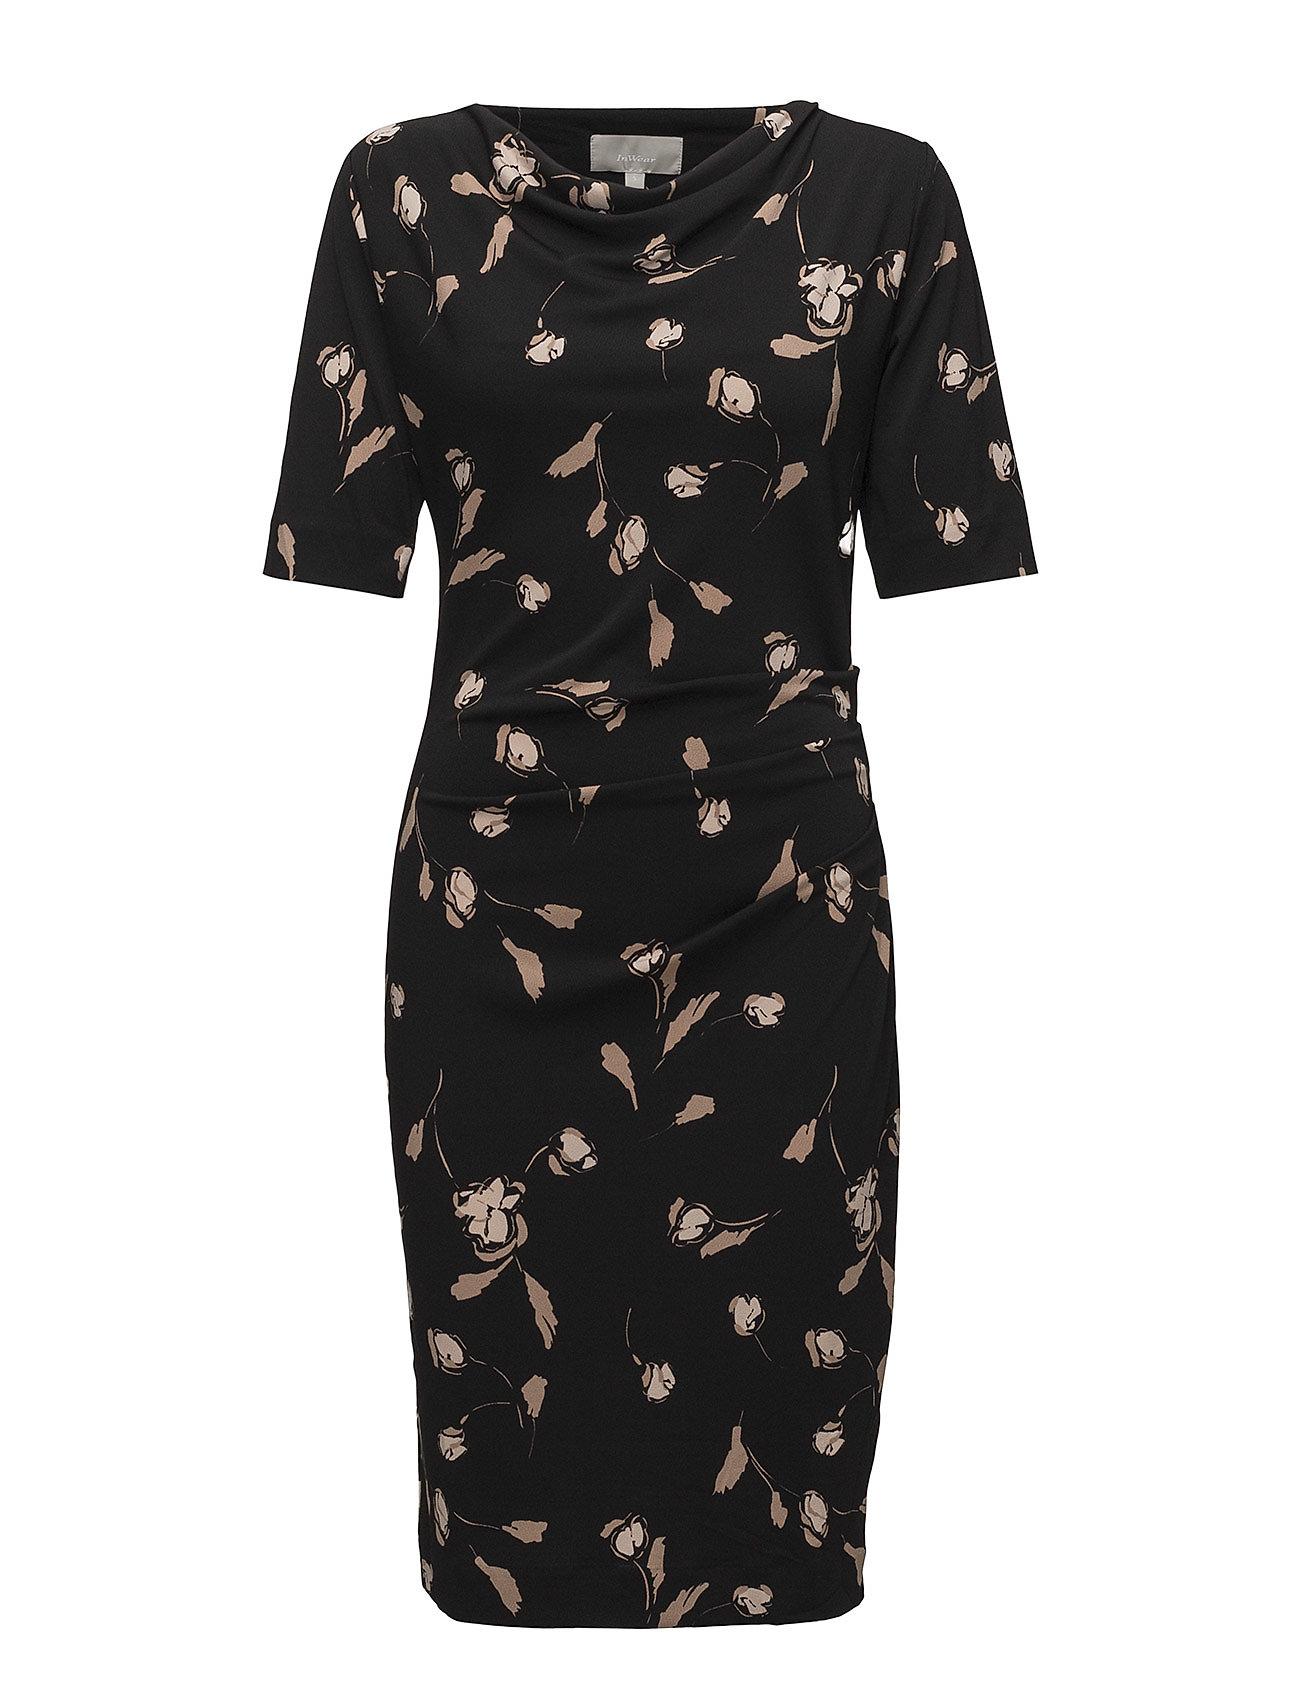 InWear Tebina Cowl Dress KNTG - SIMPLIFIED FLOWER BLACK